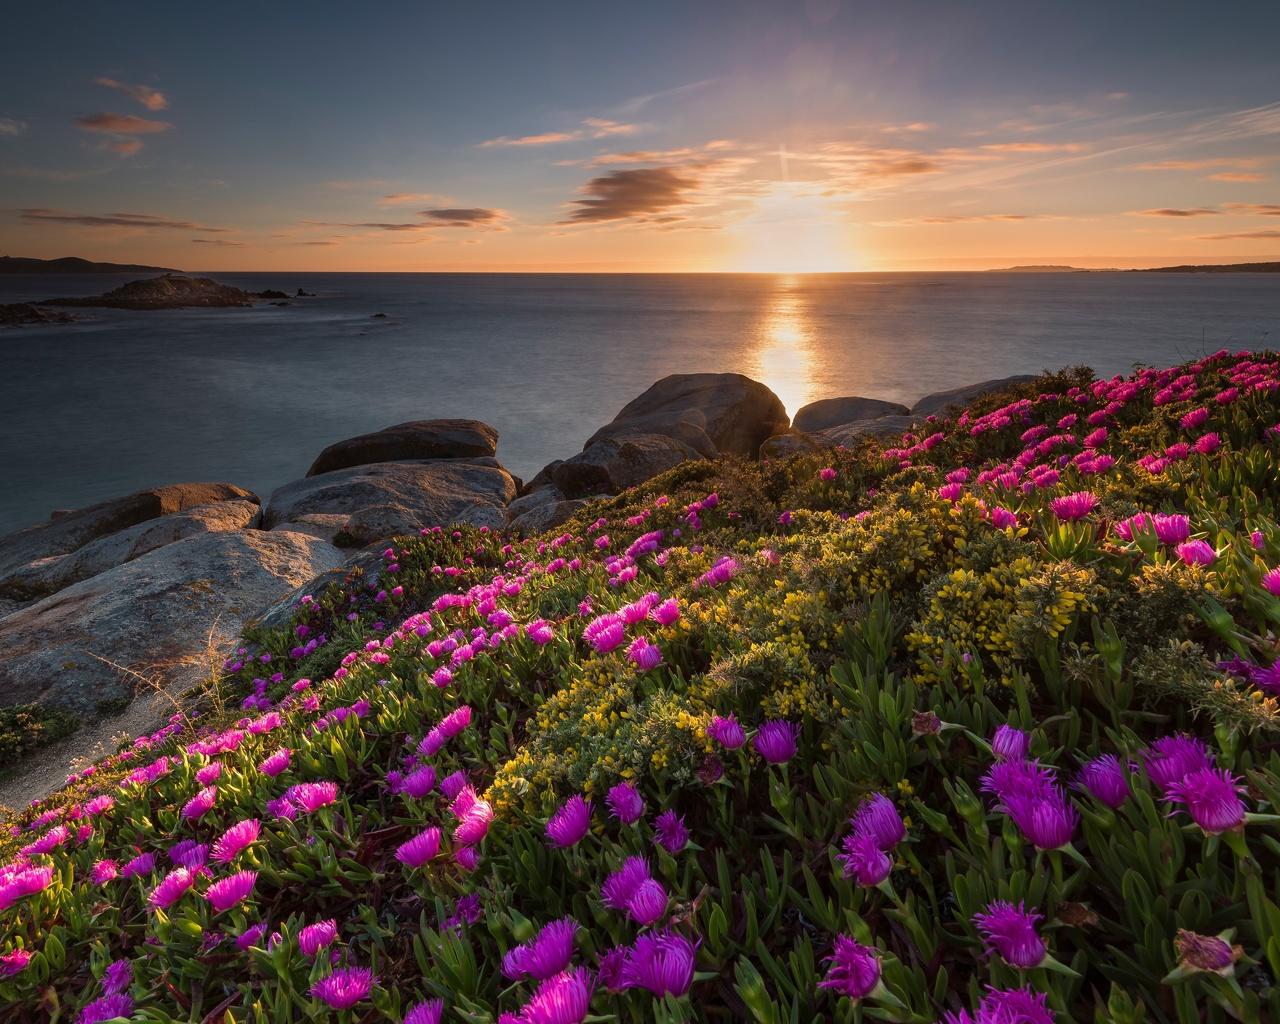 цветы, море, горизонт